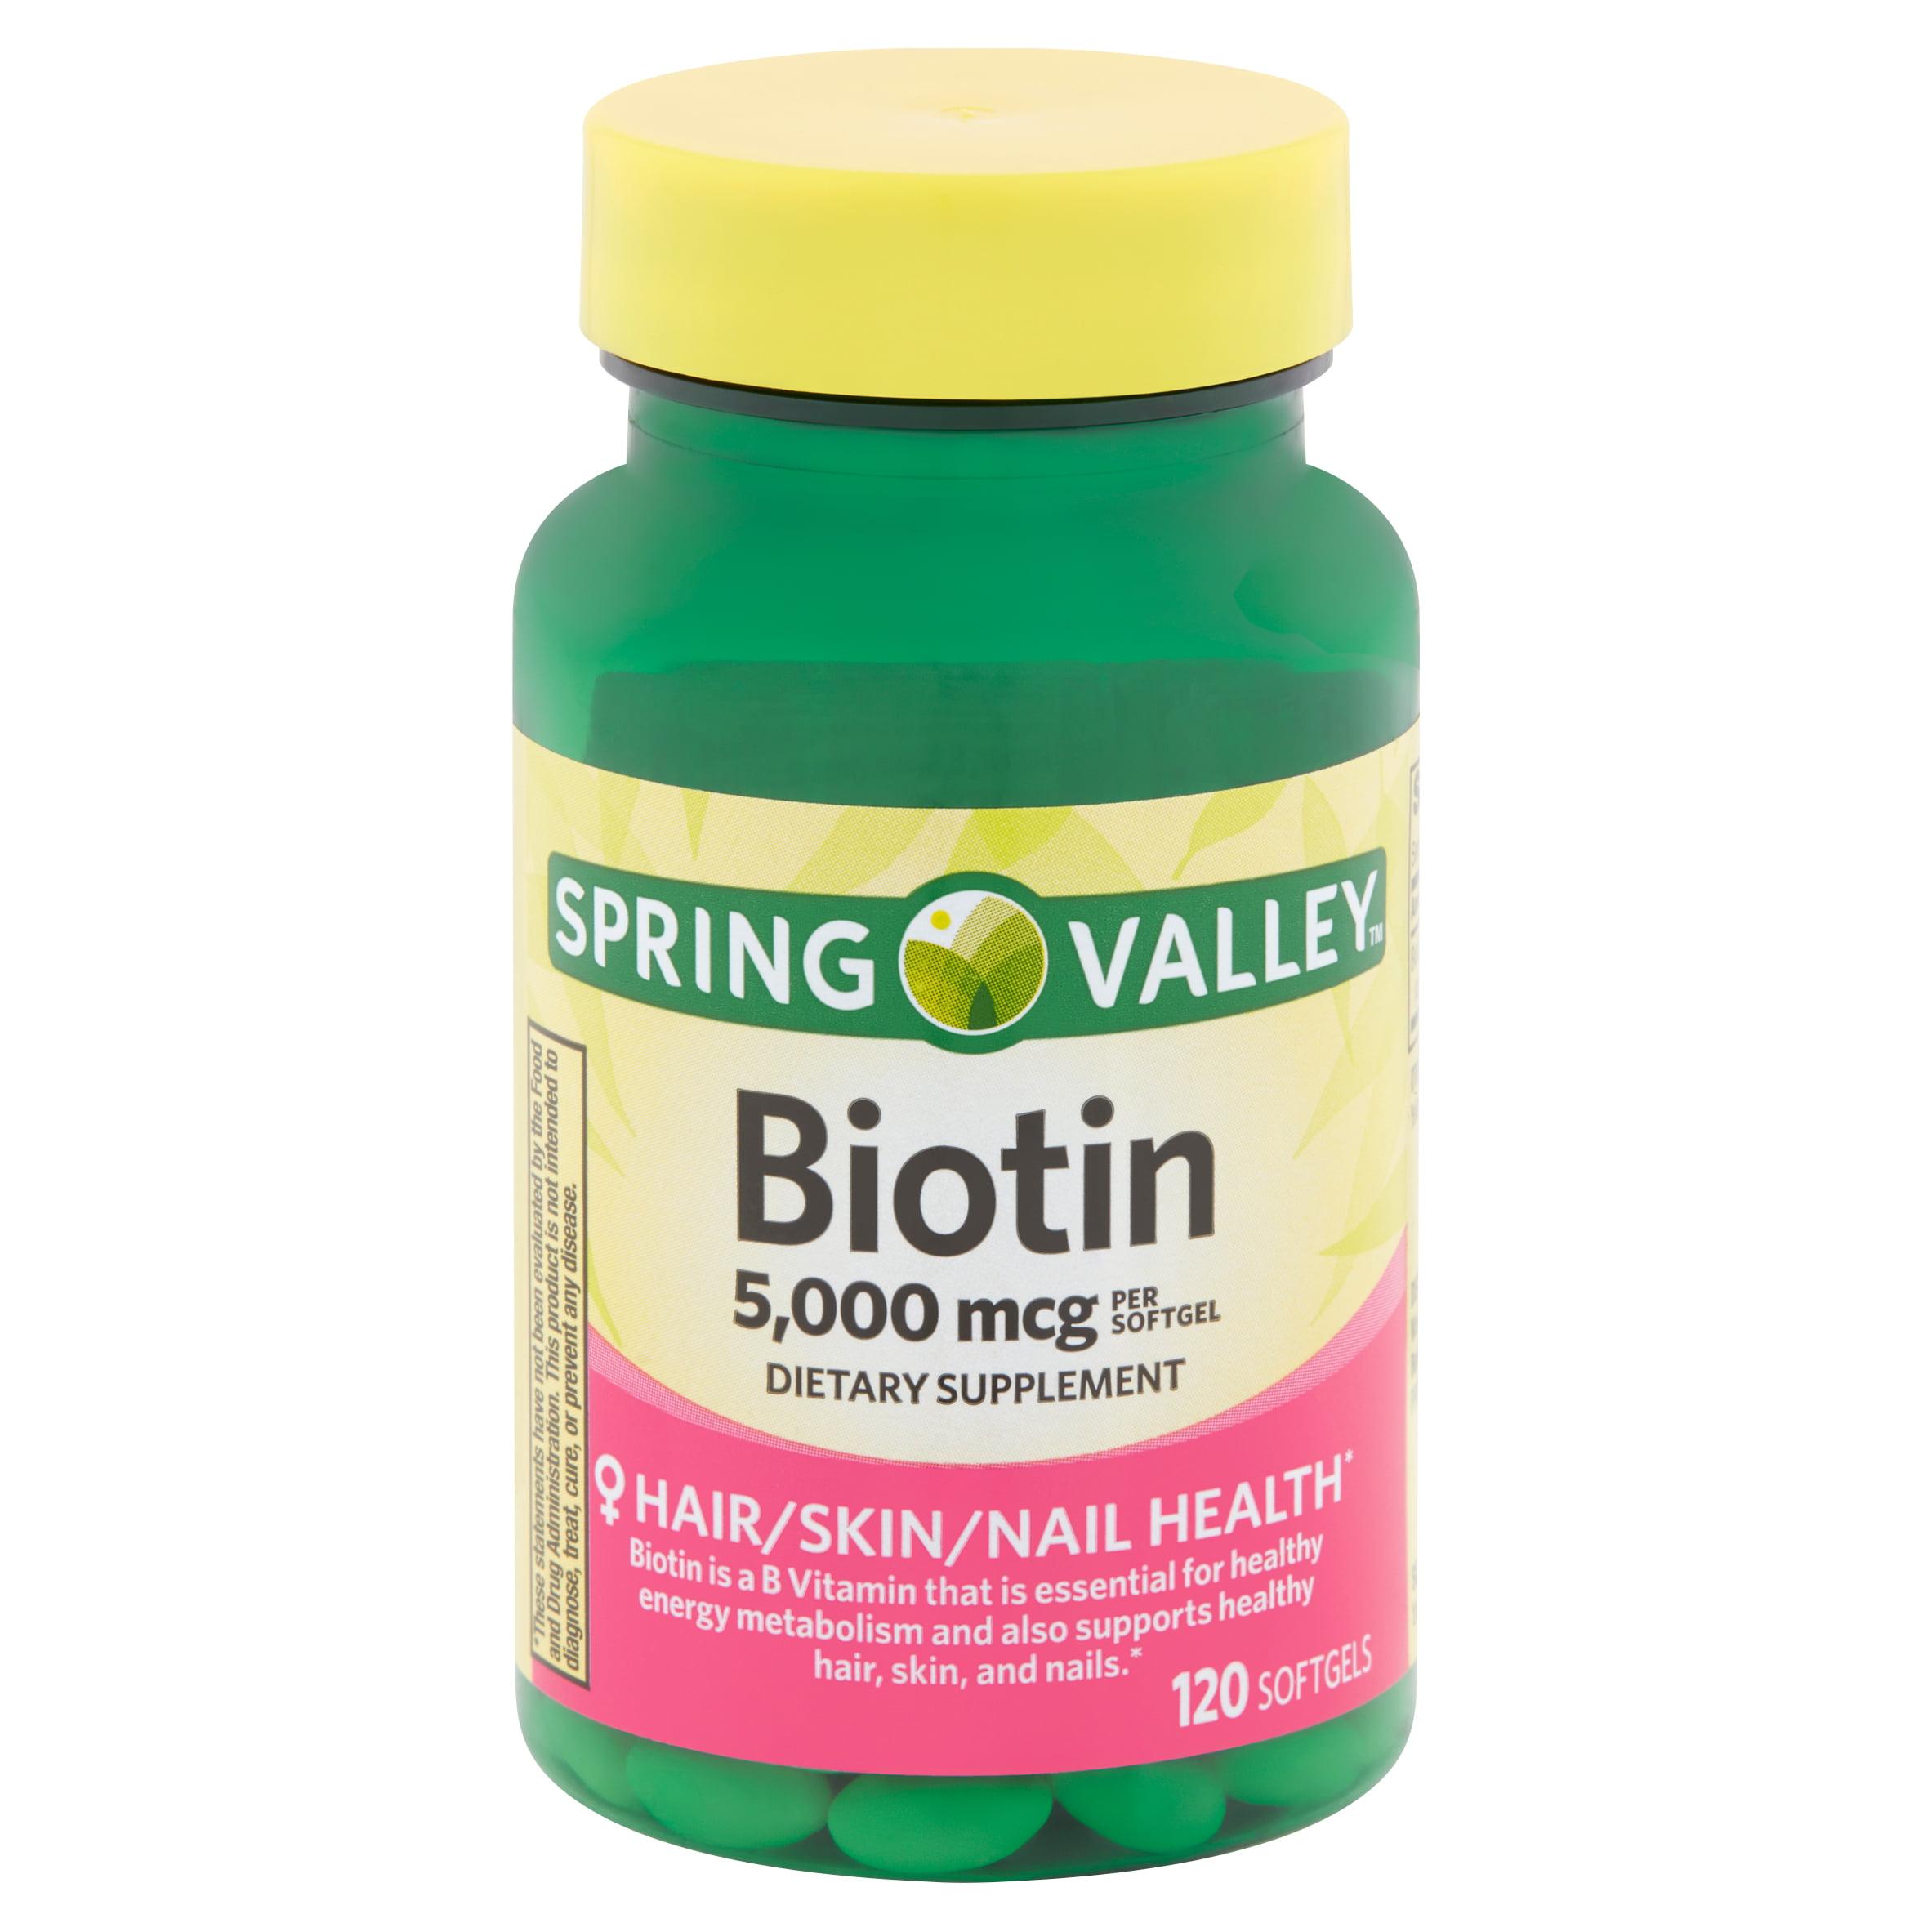 Walma Com: Spring Valley Biotin Softgels, 5,000 Mcg, 120 Count